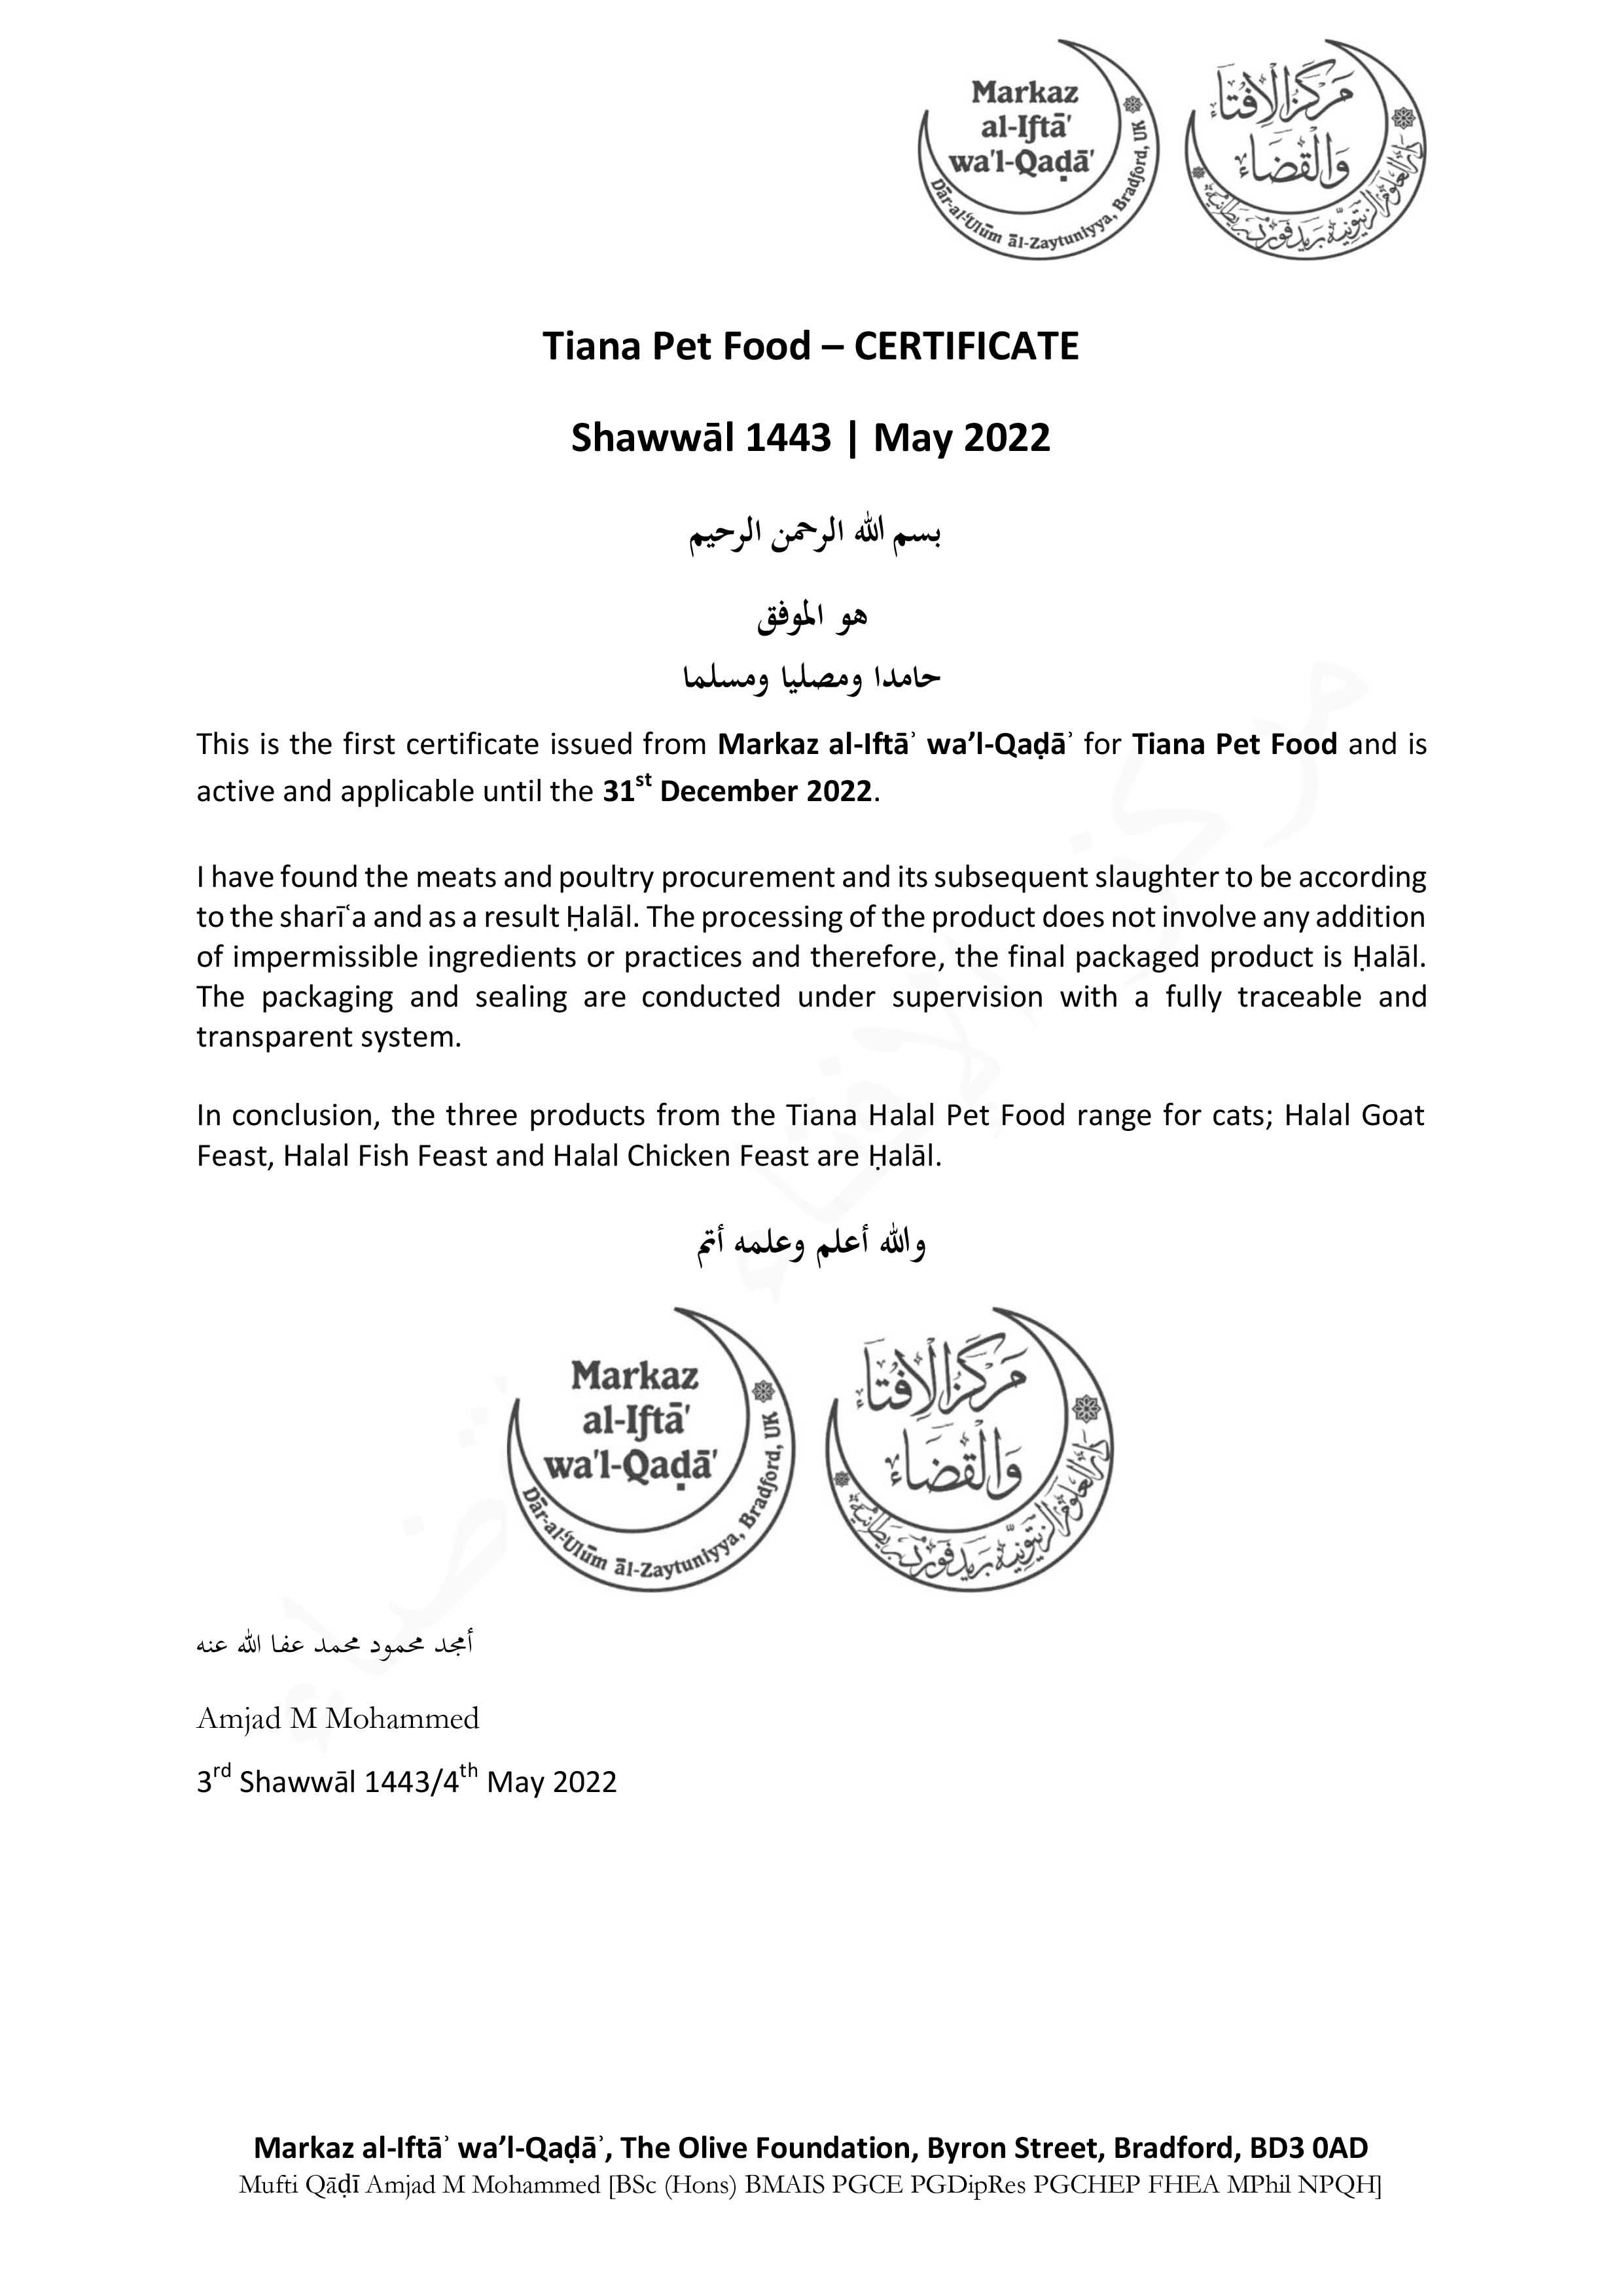 tiana-certificate.jpg